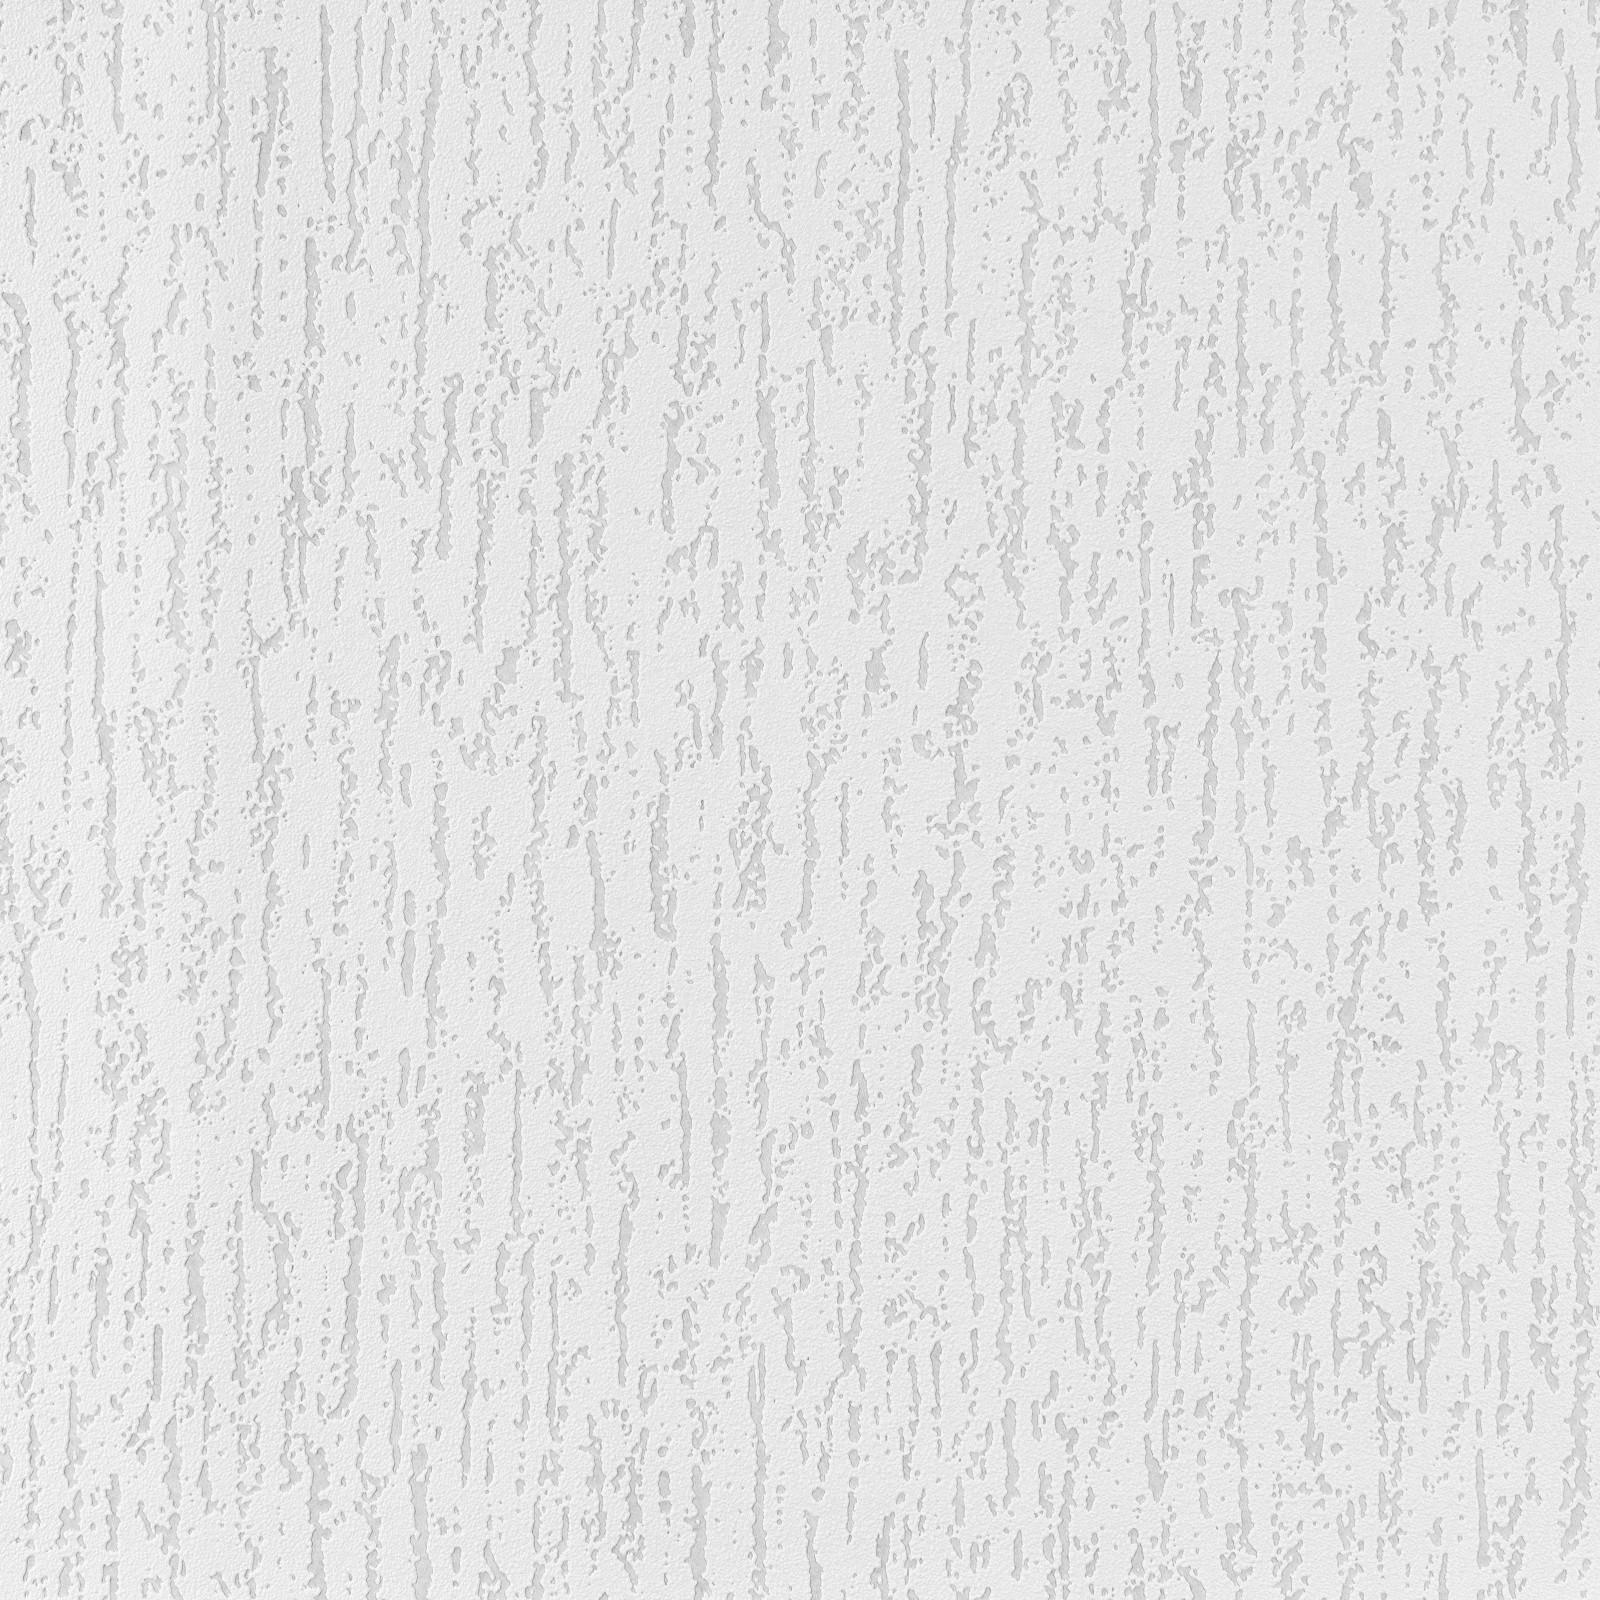 vliestapete berstreichbar uni wei ps 13022 14. Black Bedroom Furniture Sets. Home Design Ideas